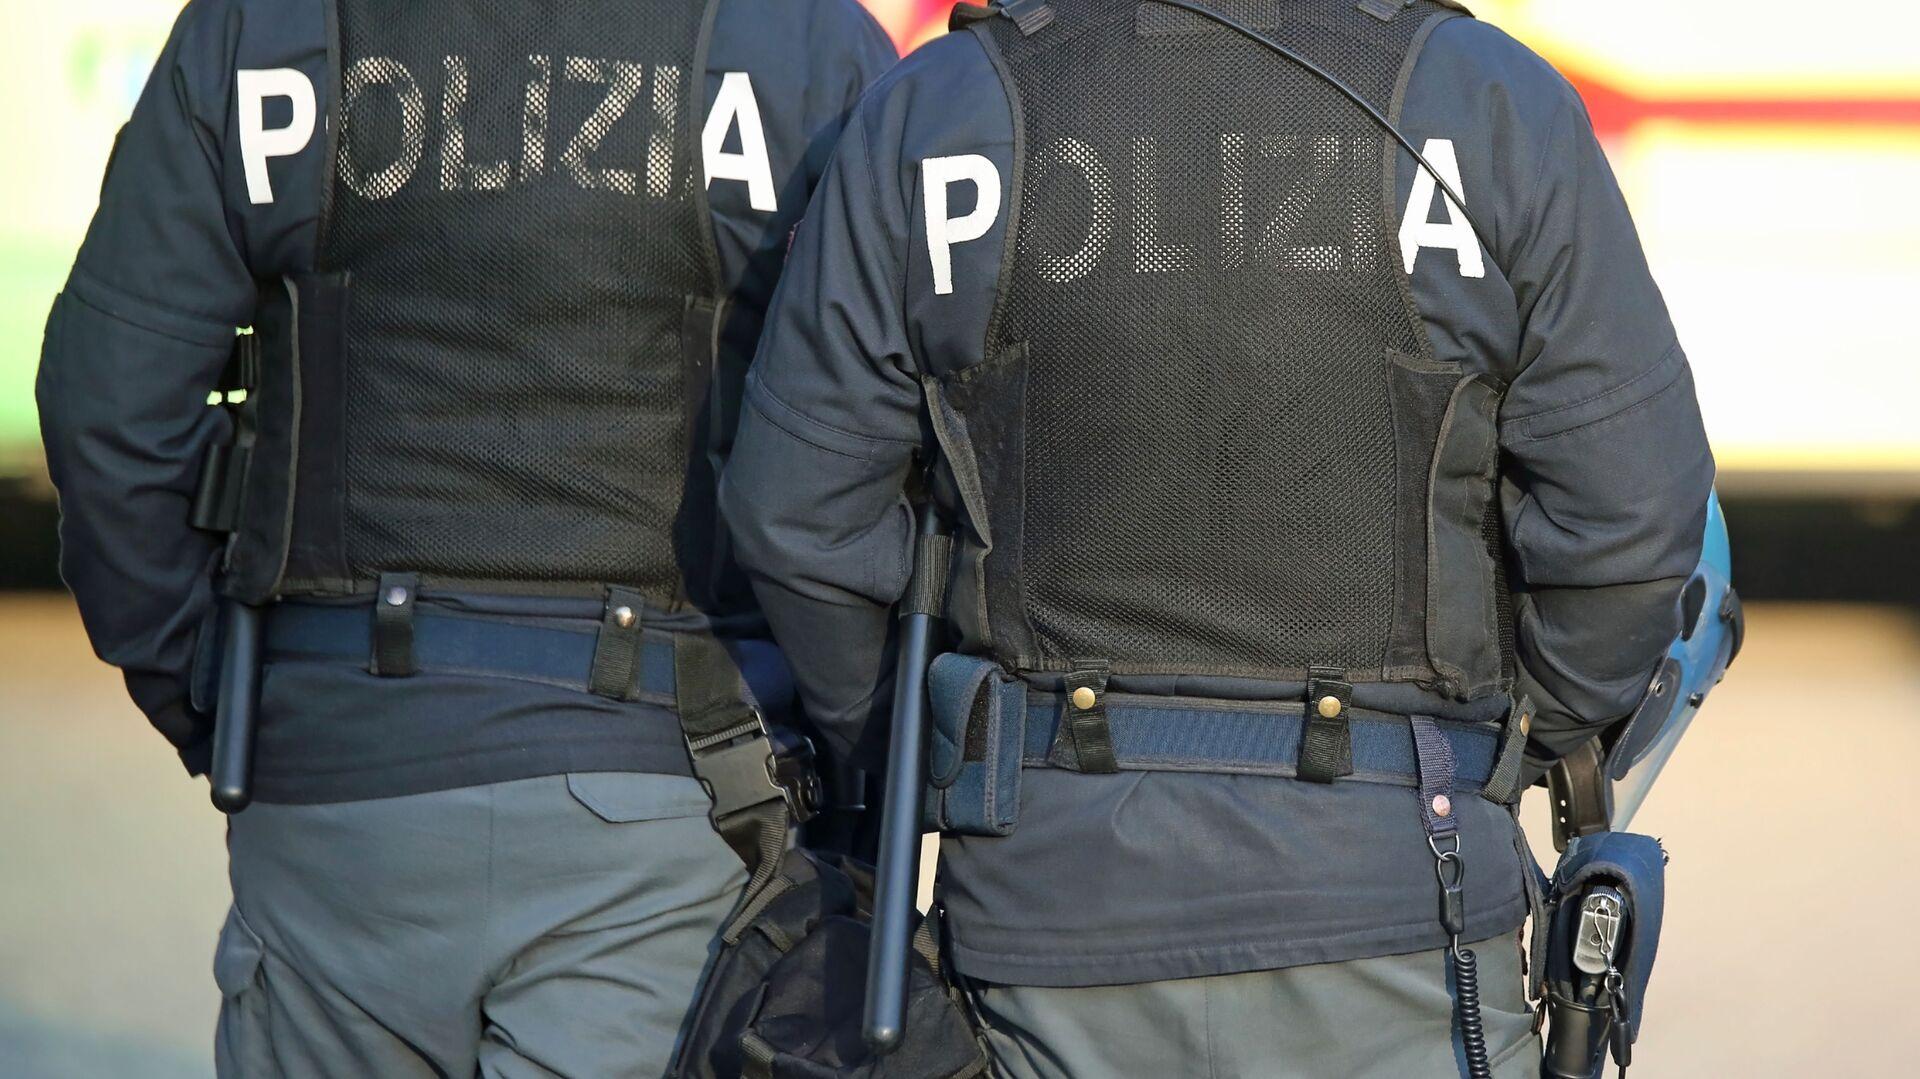 La polizia italiana - Sputnik Italia, 1920, 01.05.2021